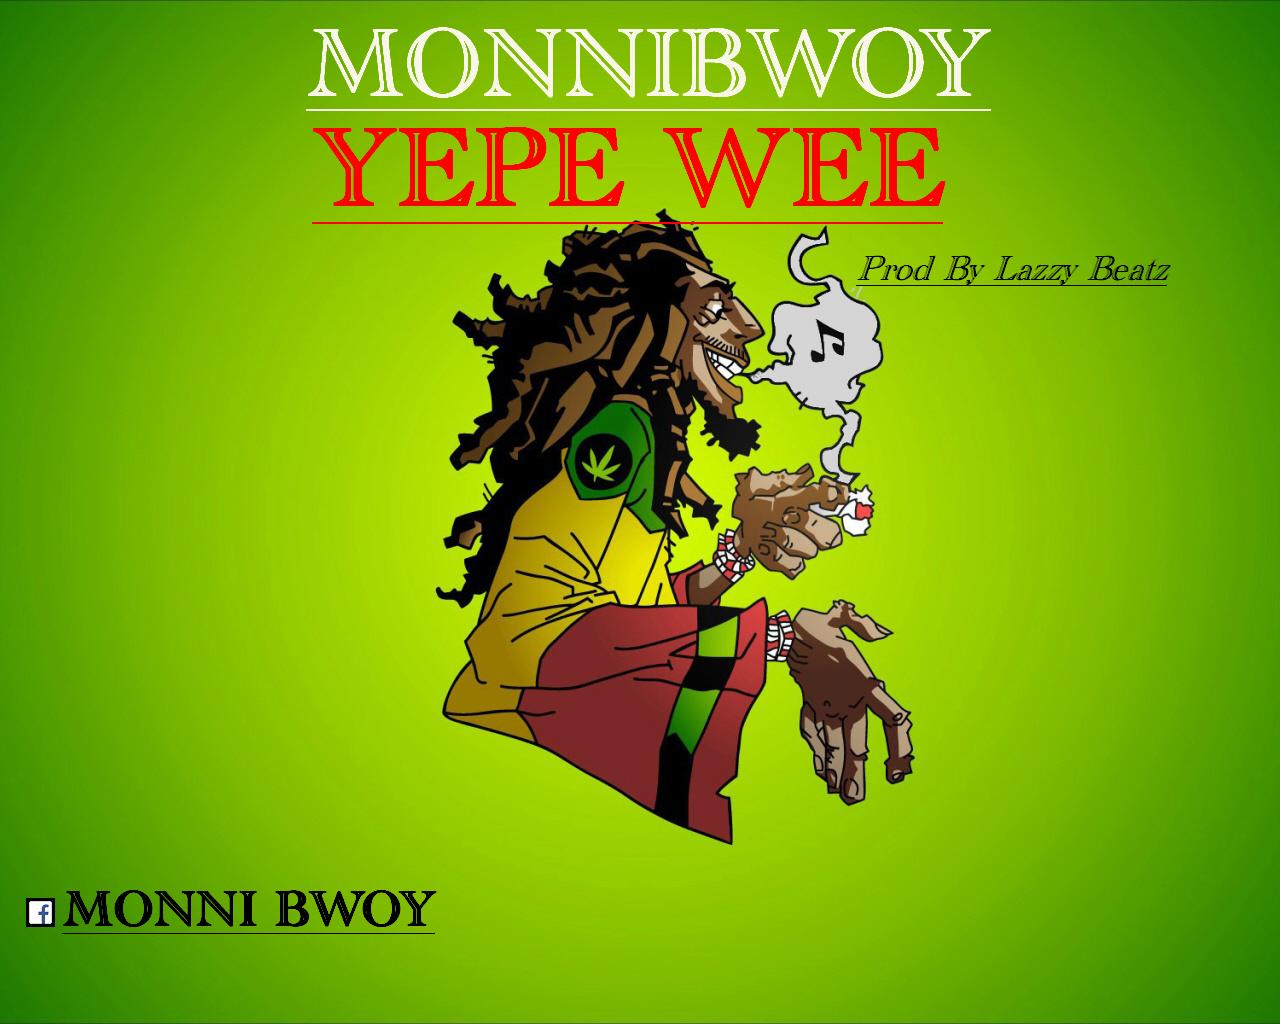 MonniBwoy – Yepe Wee (Prod. By Lazzy Beatz)